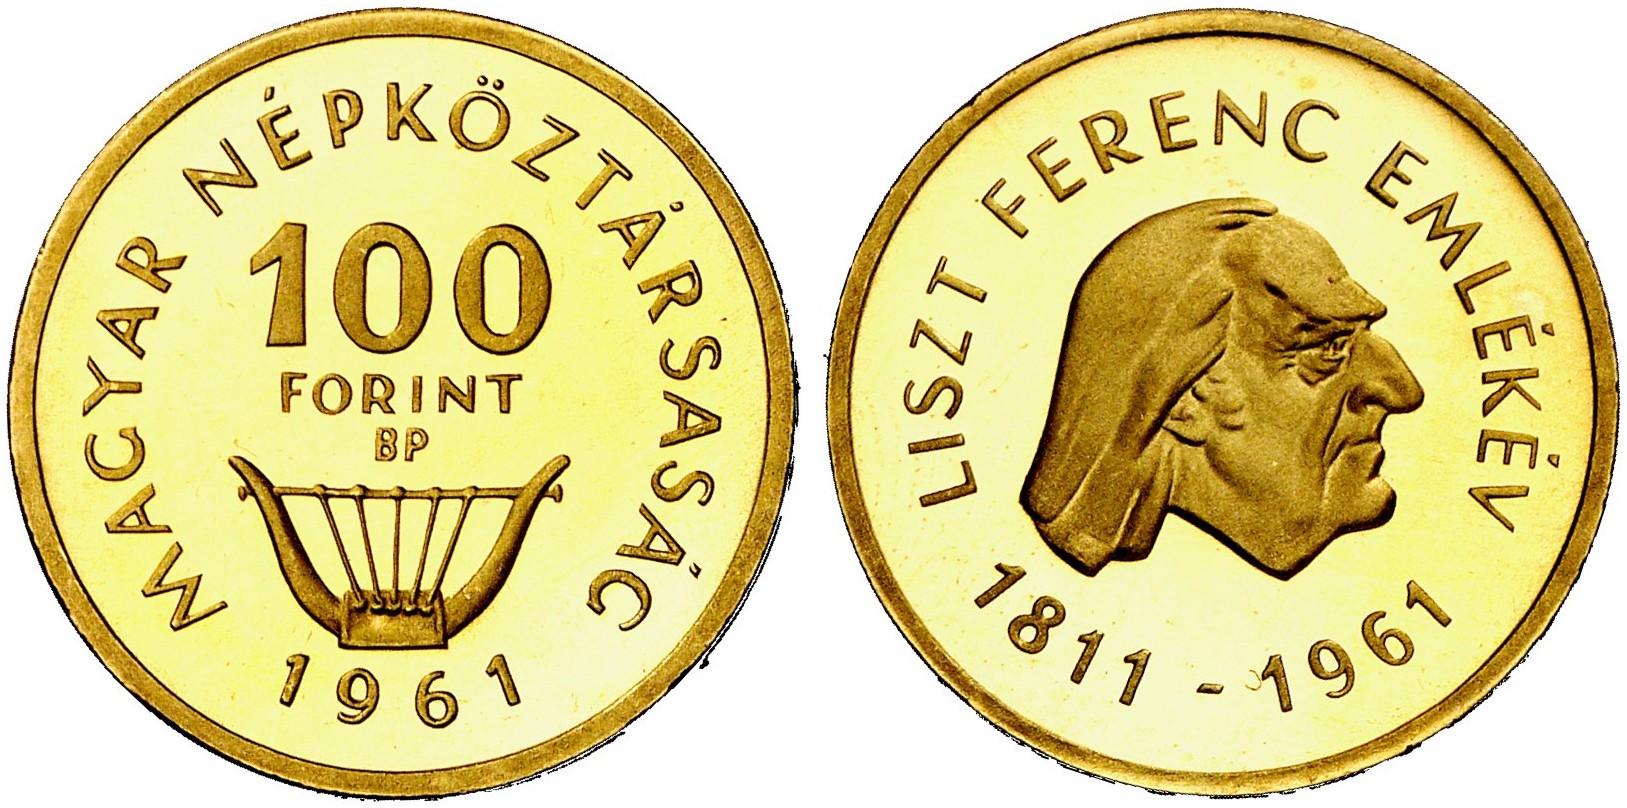 Volksrepublik 1949 1989 100 Forint 1961 Budapest Fb 612 Schl 155